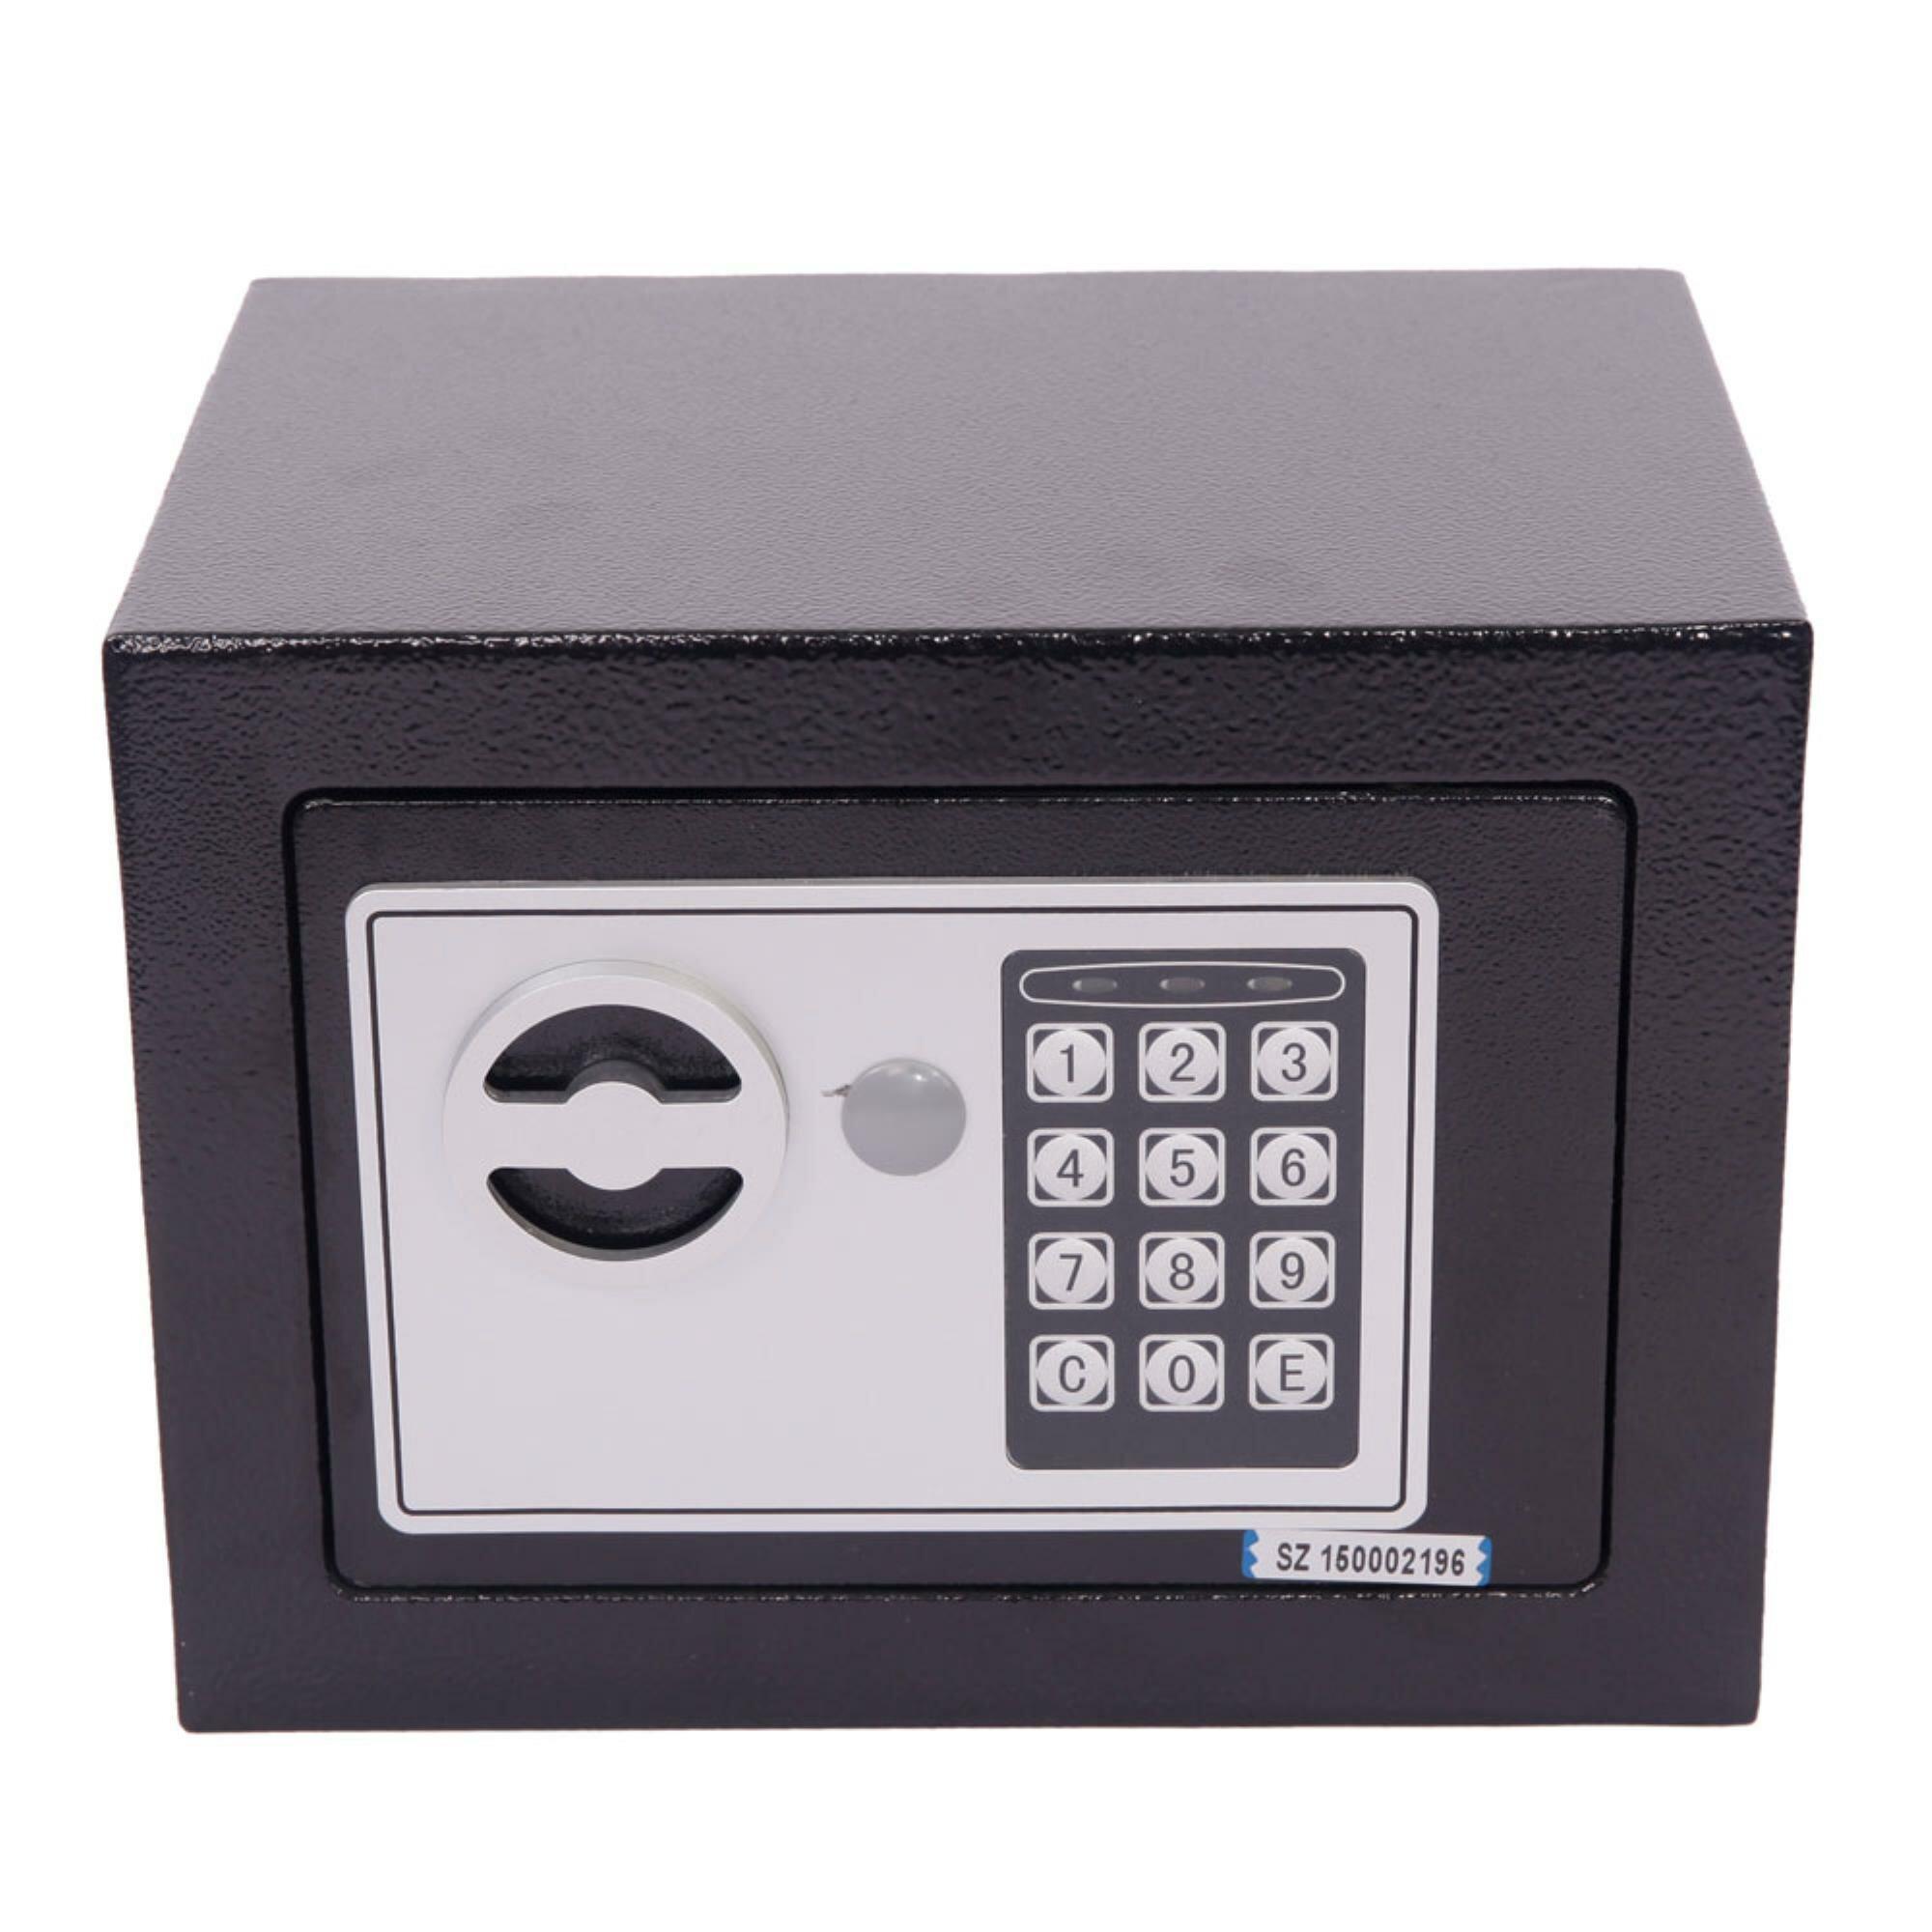 Jtplus Electronic Digital Safe Box With Keypad Lock Wayfair